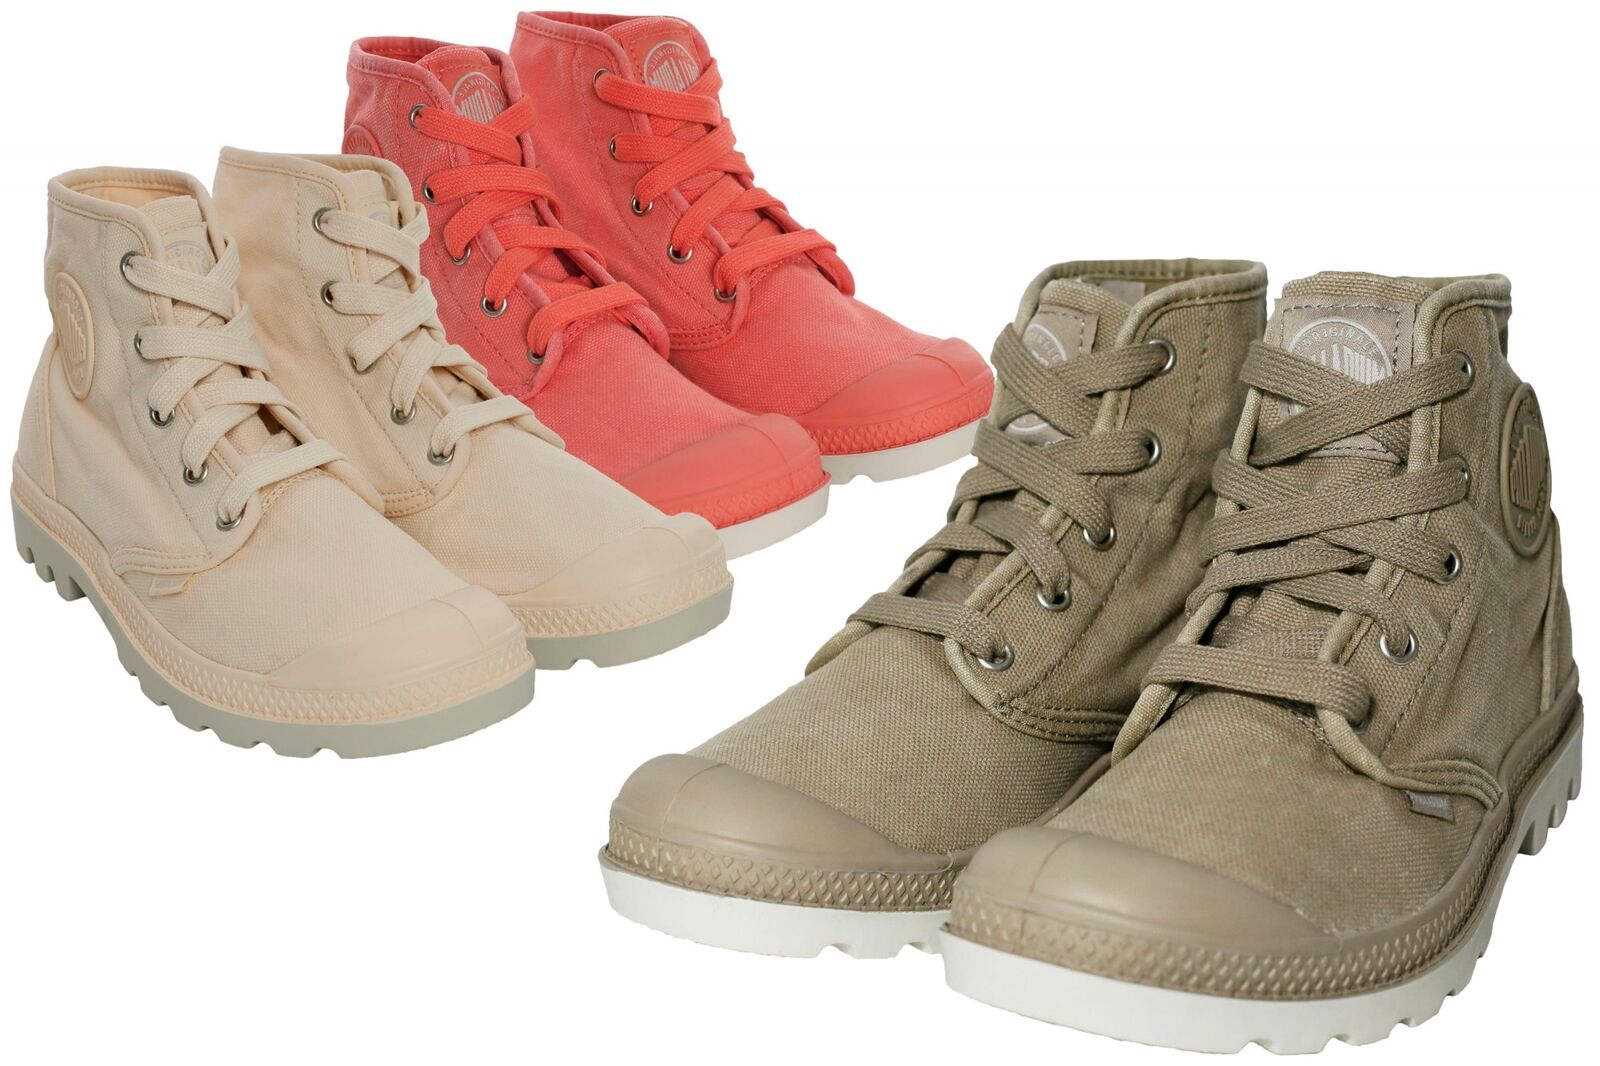 Palladium Sneaker Pampa Hi Boots Stivali Sneaker Palladium turn scarpa tela Donna 6ff3c9